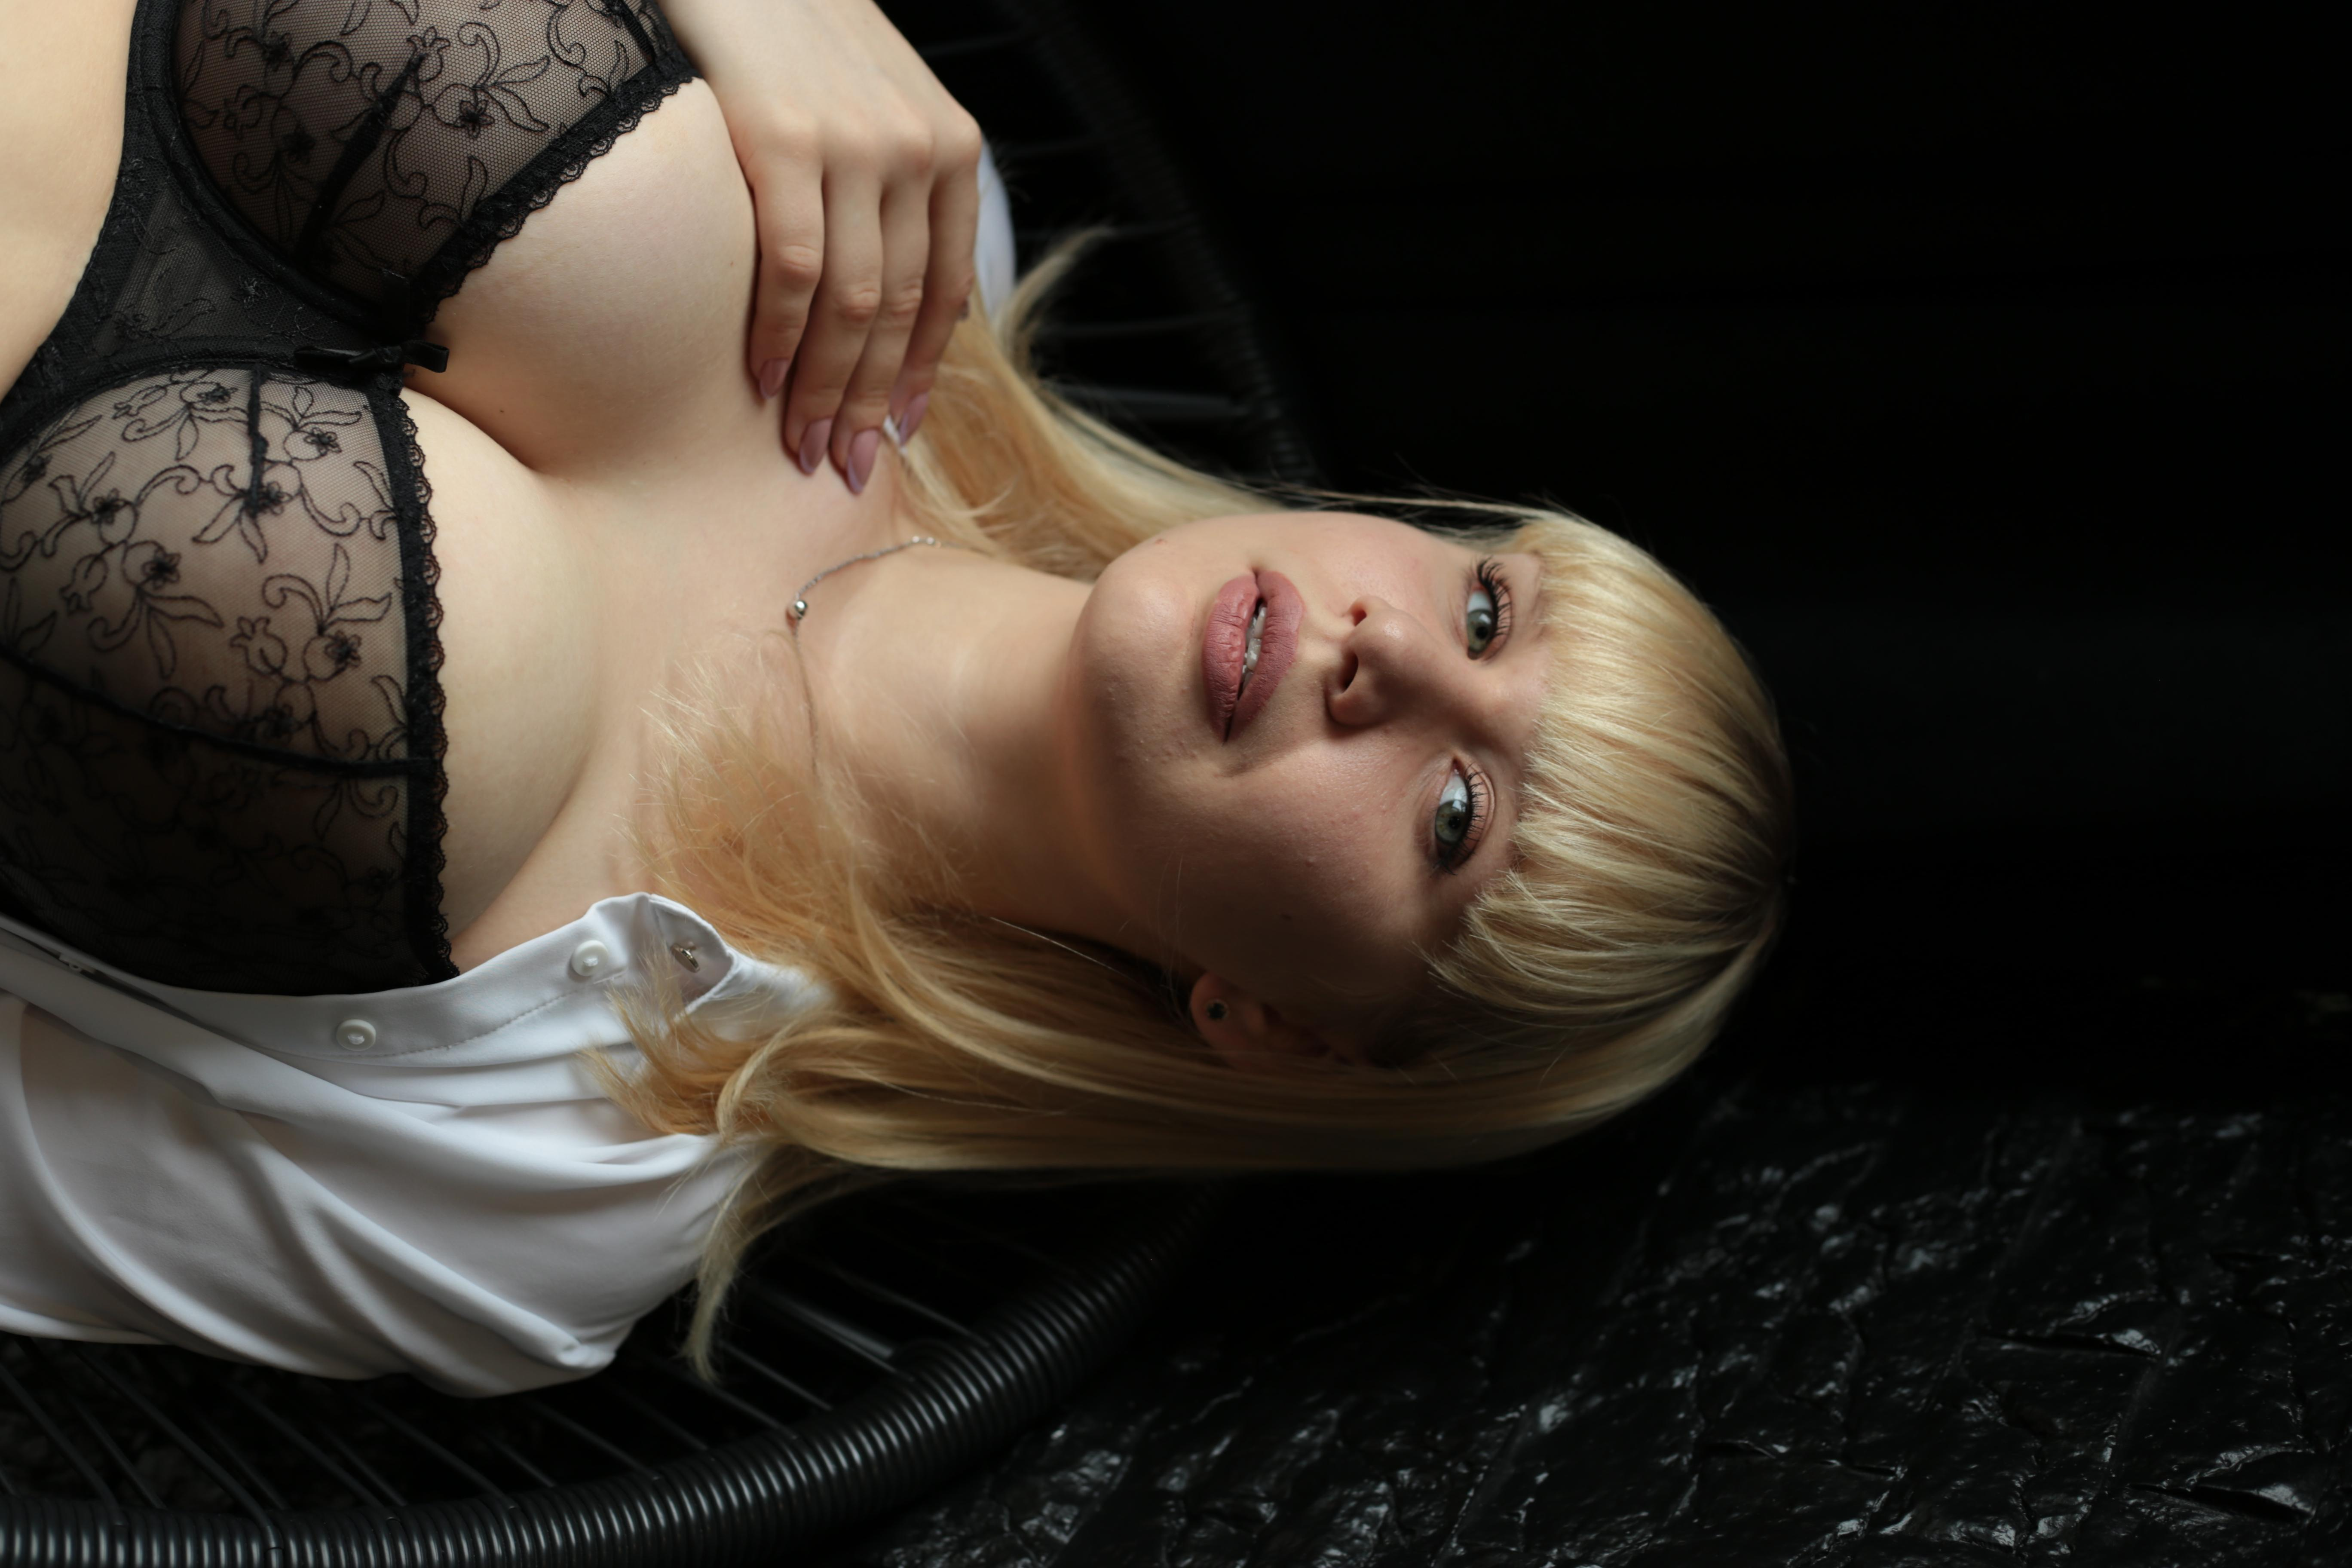 Sky blondex?s=goktmyqpzaijhkf0tbvtopzcalcqmfjzkbxzwduo7uo=